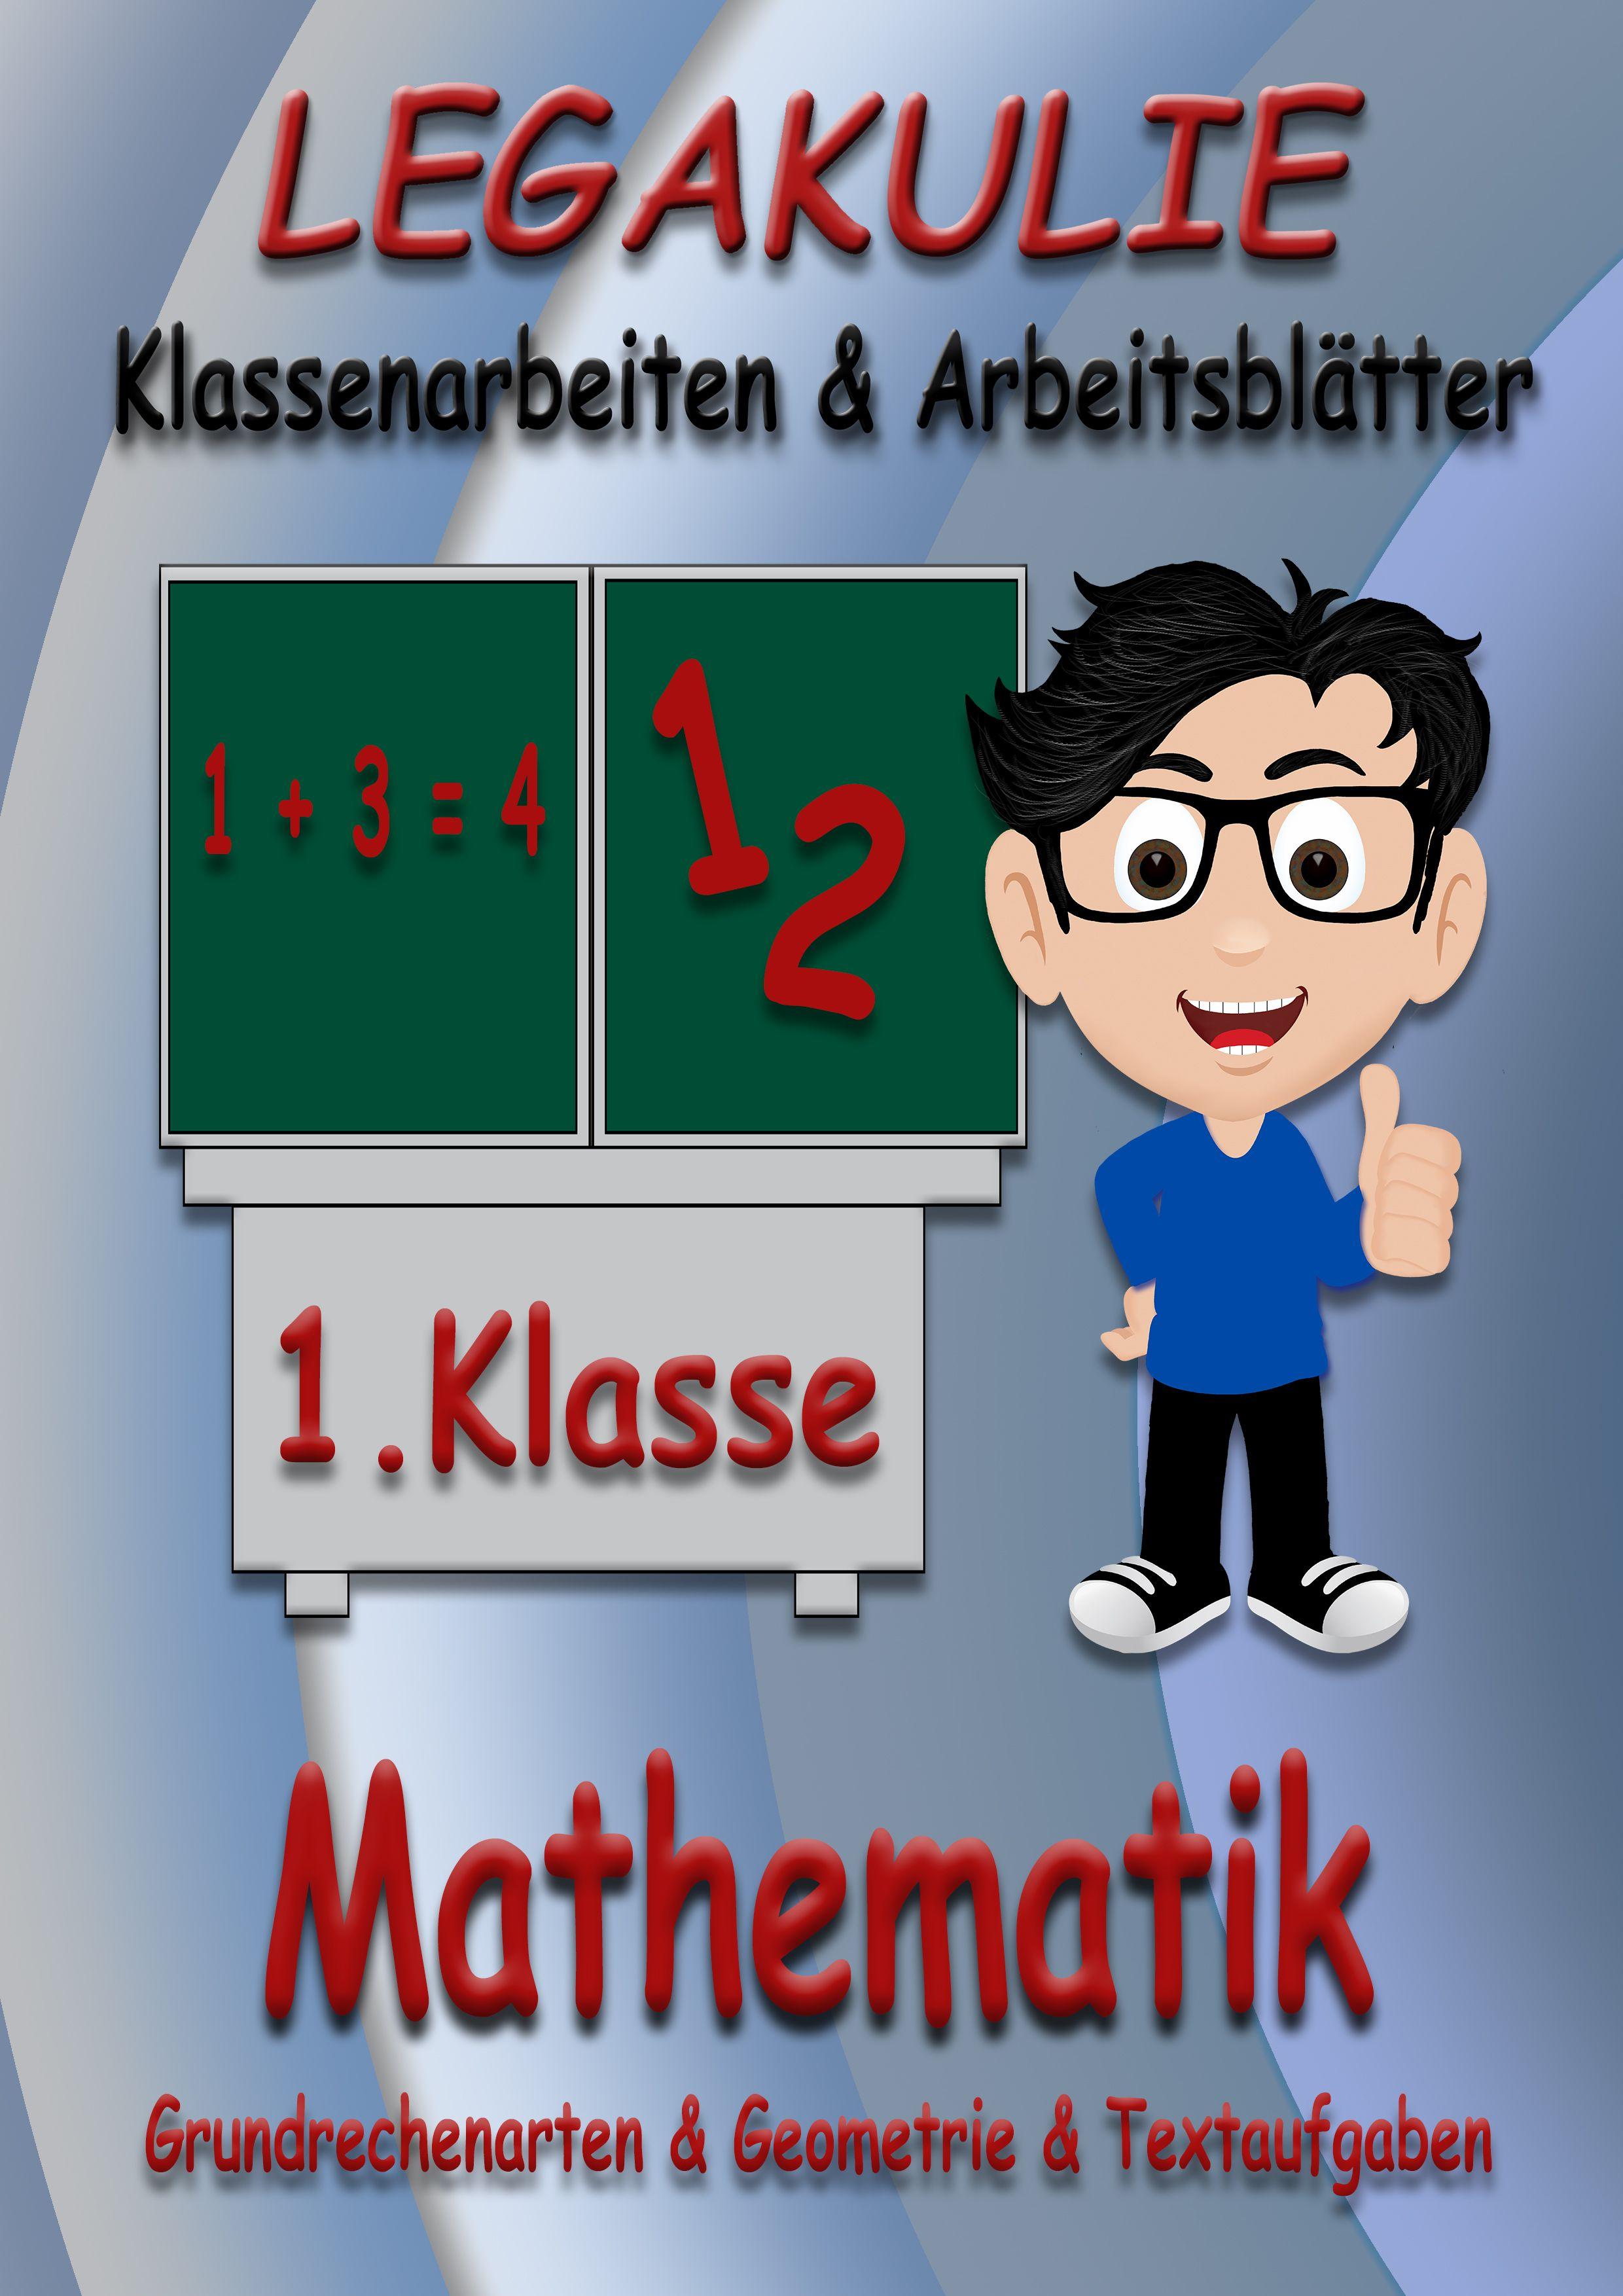 Mathematik #1Klasse #Arbeitsblatt #PDF Arbeitsblätter / Übungen ...